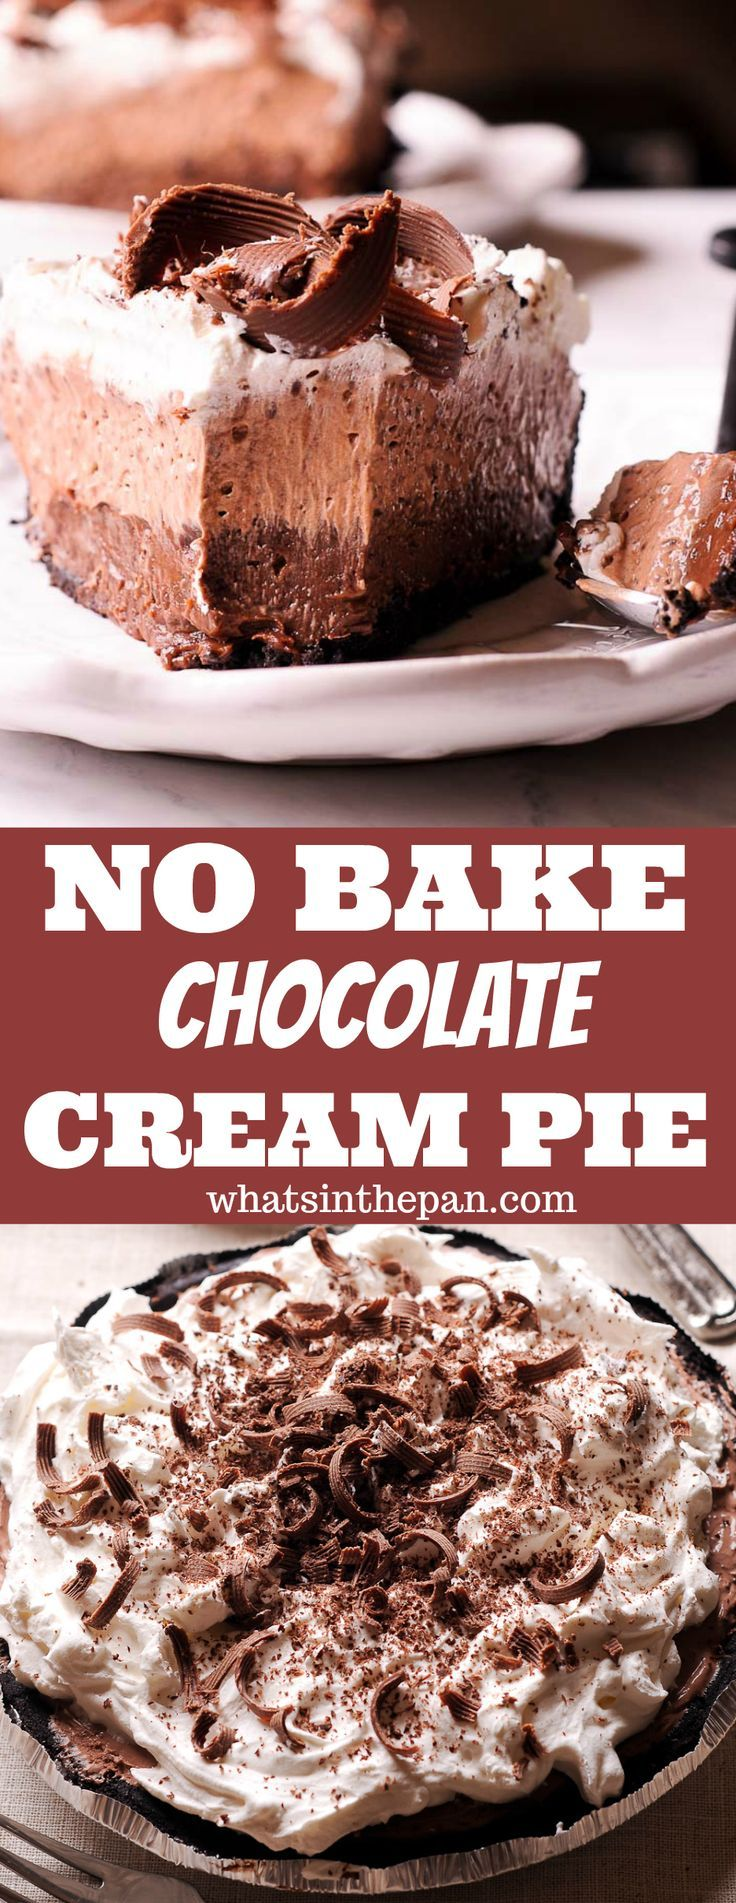 Food Photography - No Bake Chocolate Cream Pie Food Photography - No Bake Chocolate Cream Pie